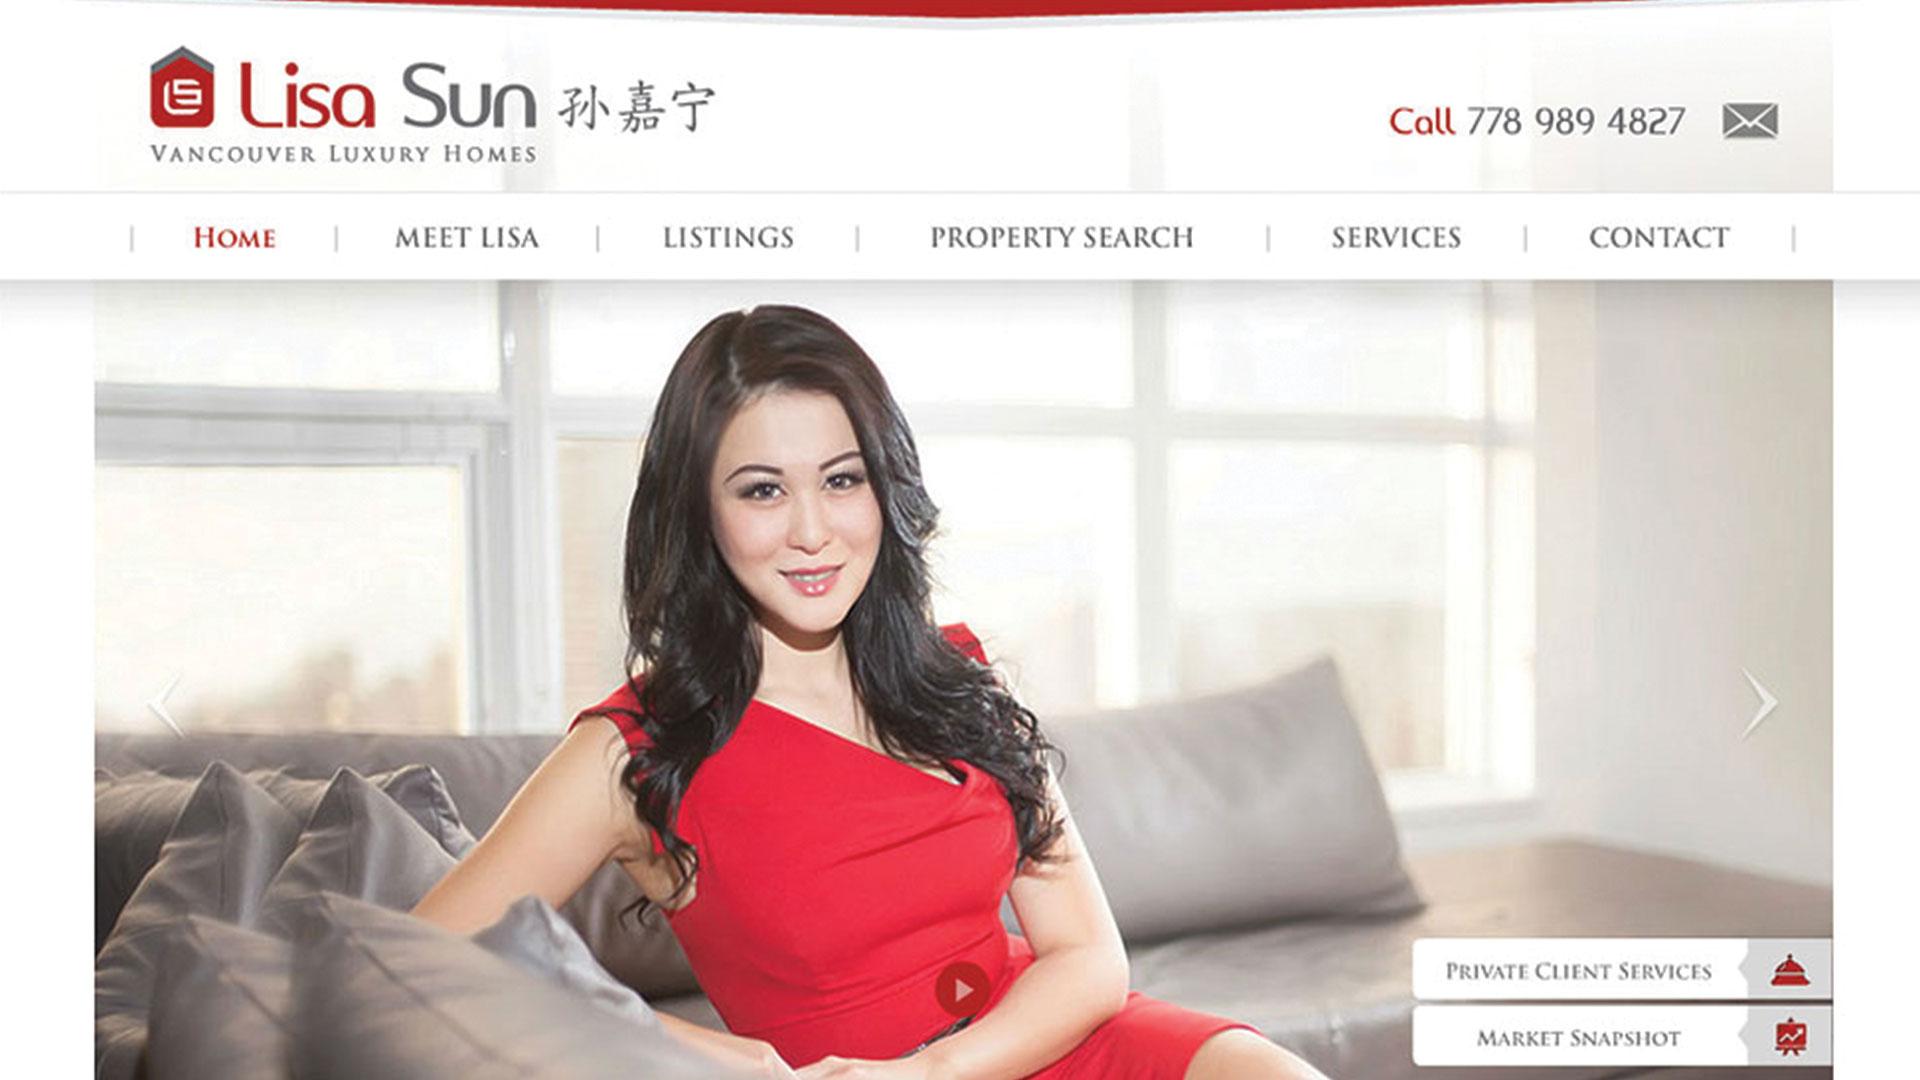 lisa-sun-Vancouver-web-design-Vancouver-web-development-by-mapleweb-canada-homepage-slider-01